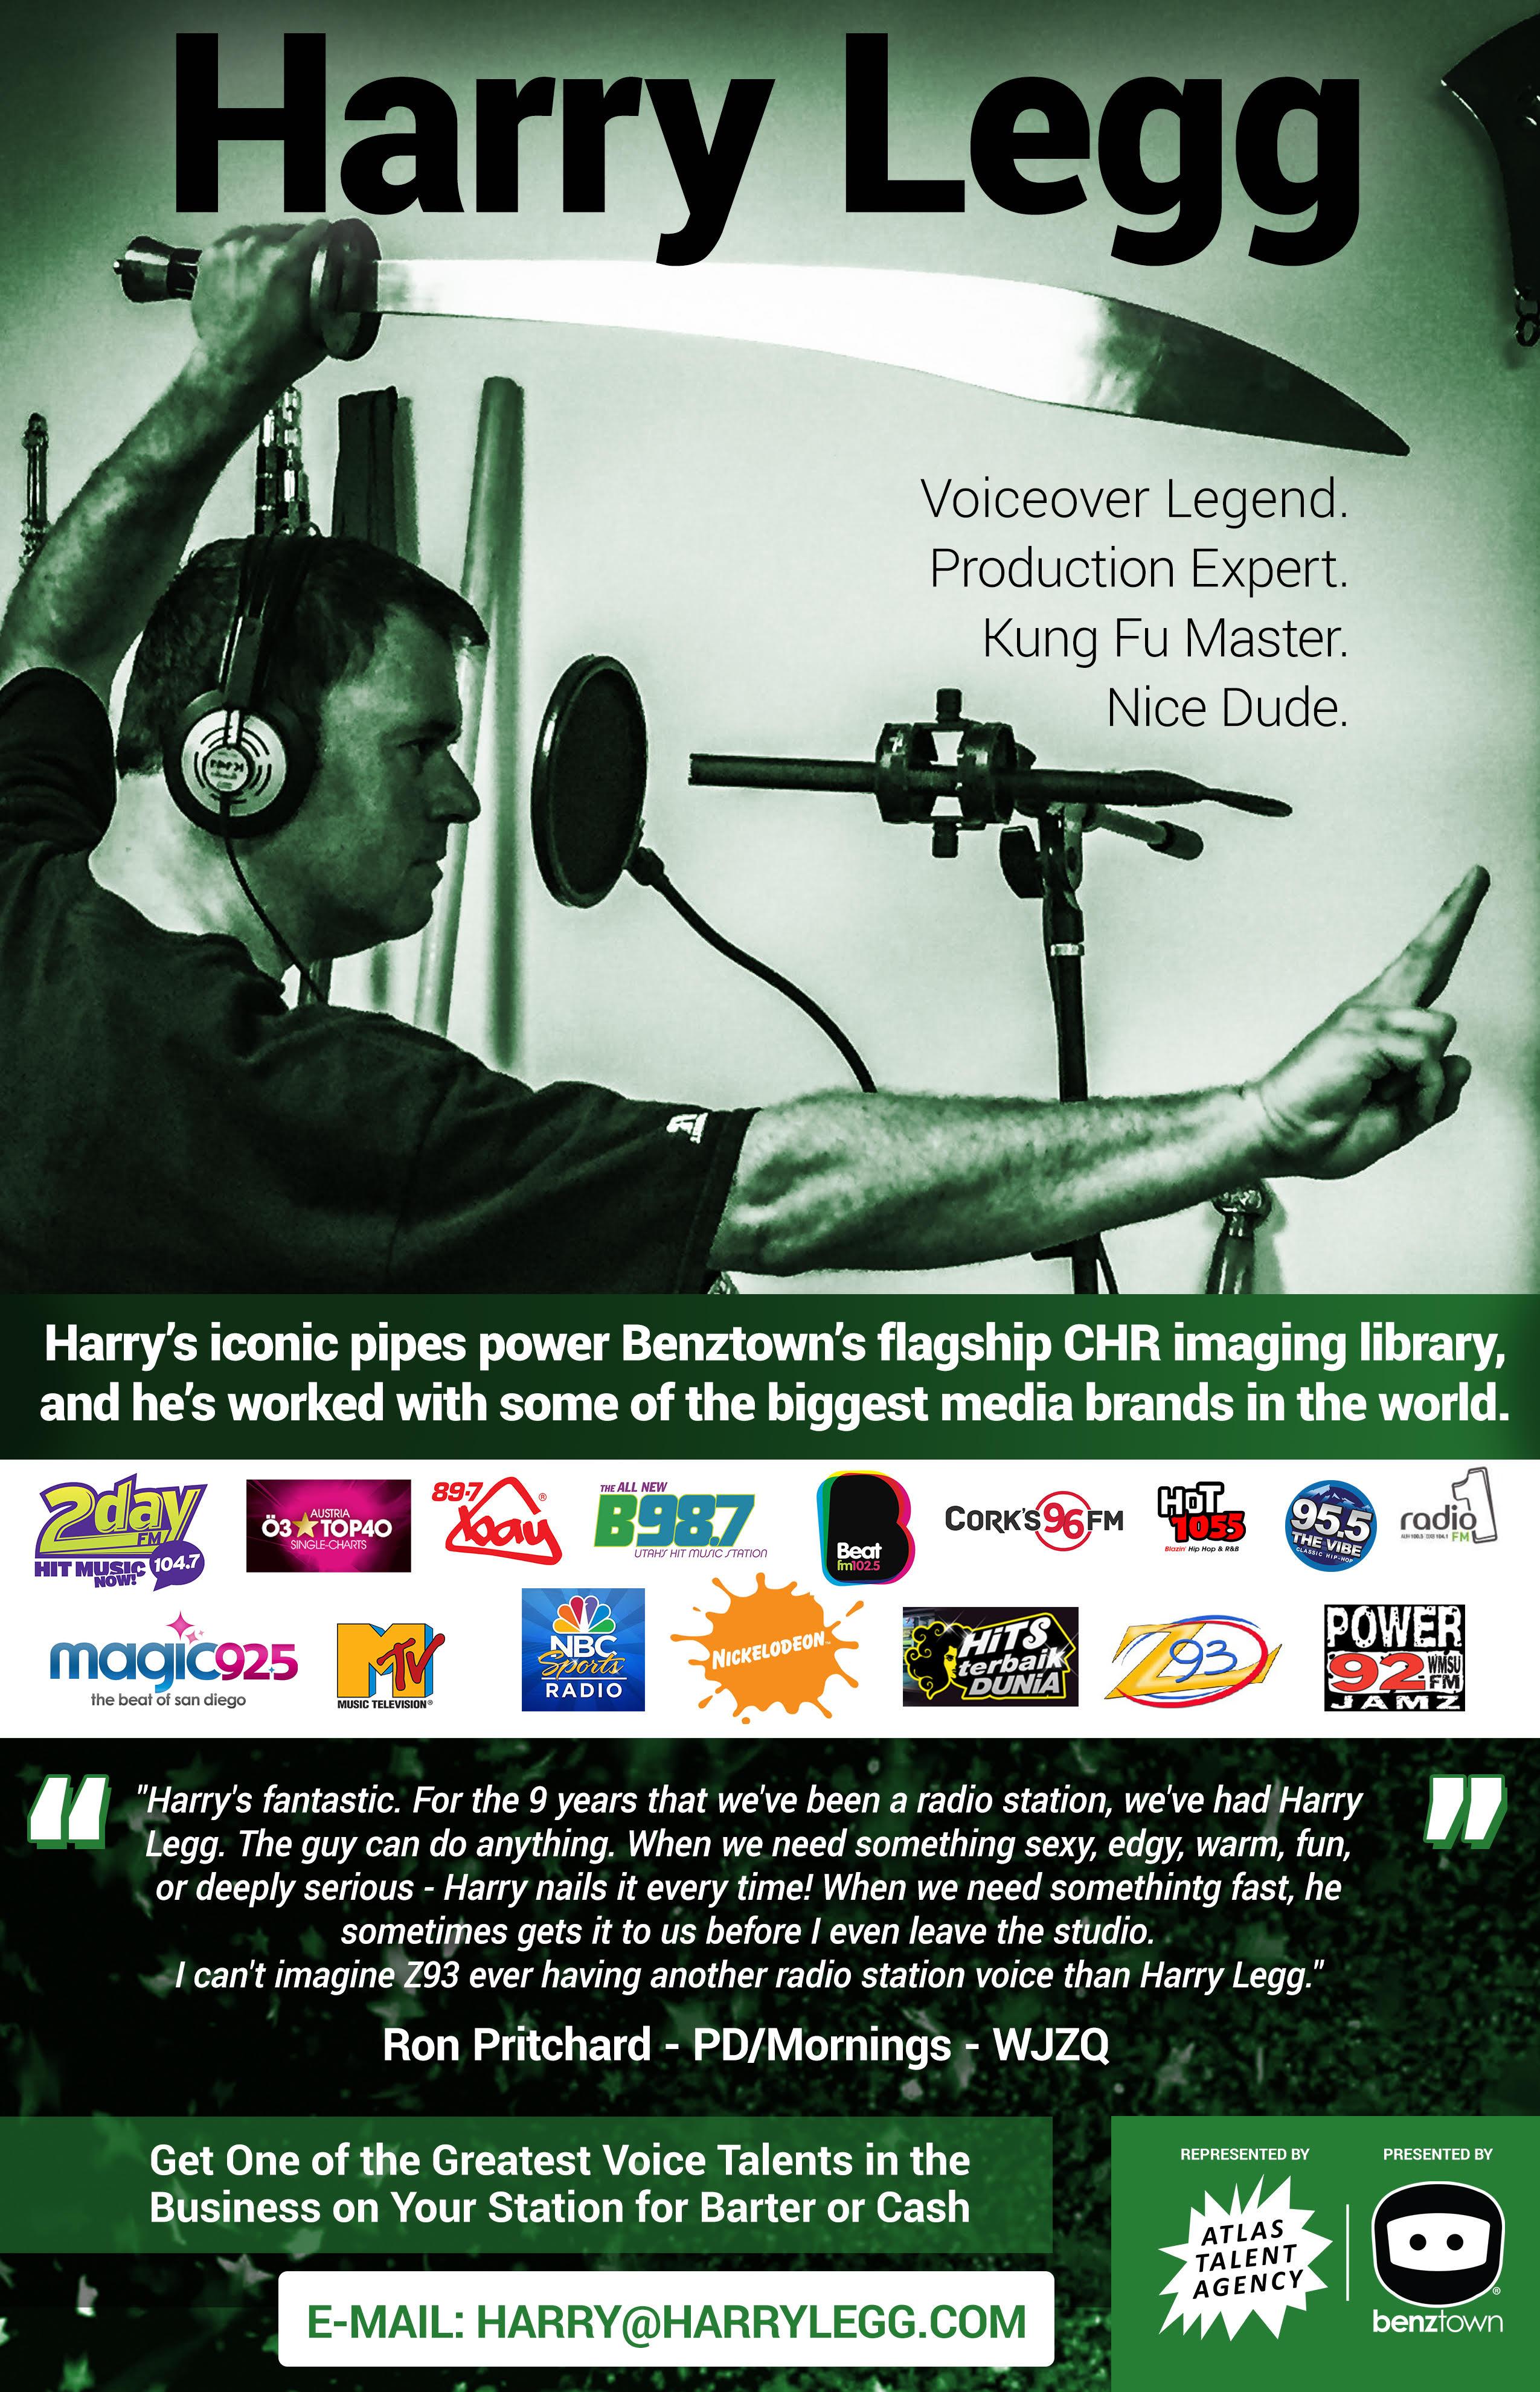 RadioJinglesPRO com – Radio Jingles, Imaging, Production